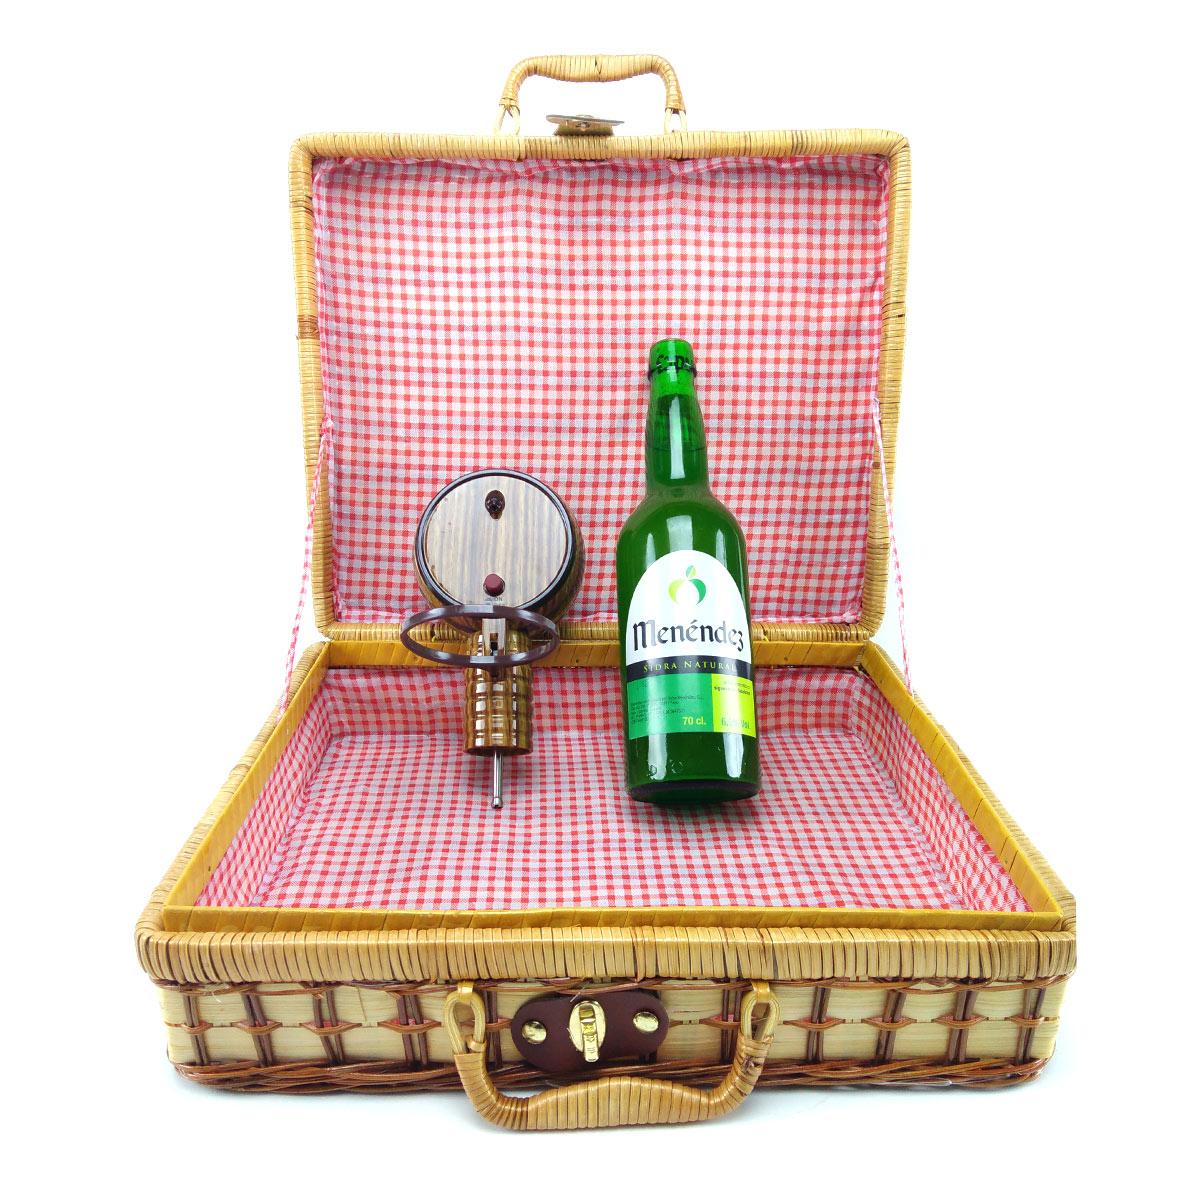 cesta-+-escanciador-barril-+-botella-sidra-menendez-2